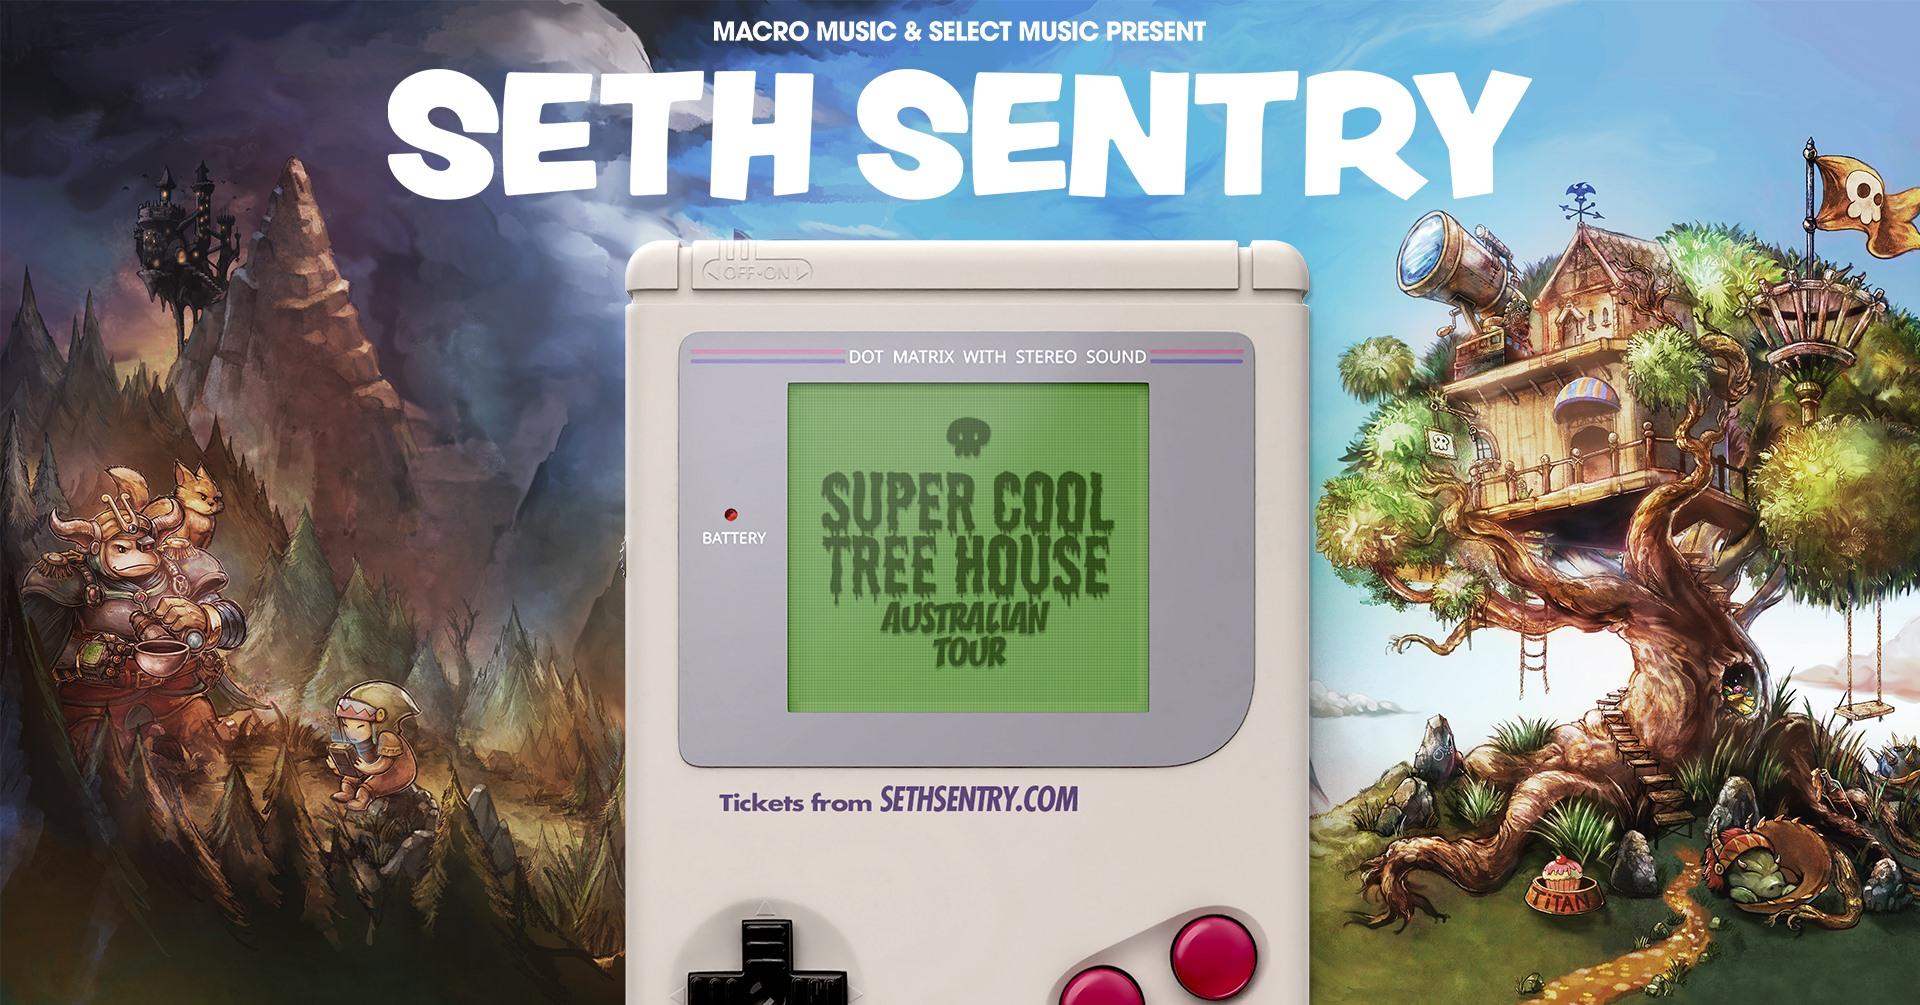 Seth Sentry – Super Cool Tree House Tour – Cambridge Hotel, Newcastle NSW – FRI 01 OCT